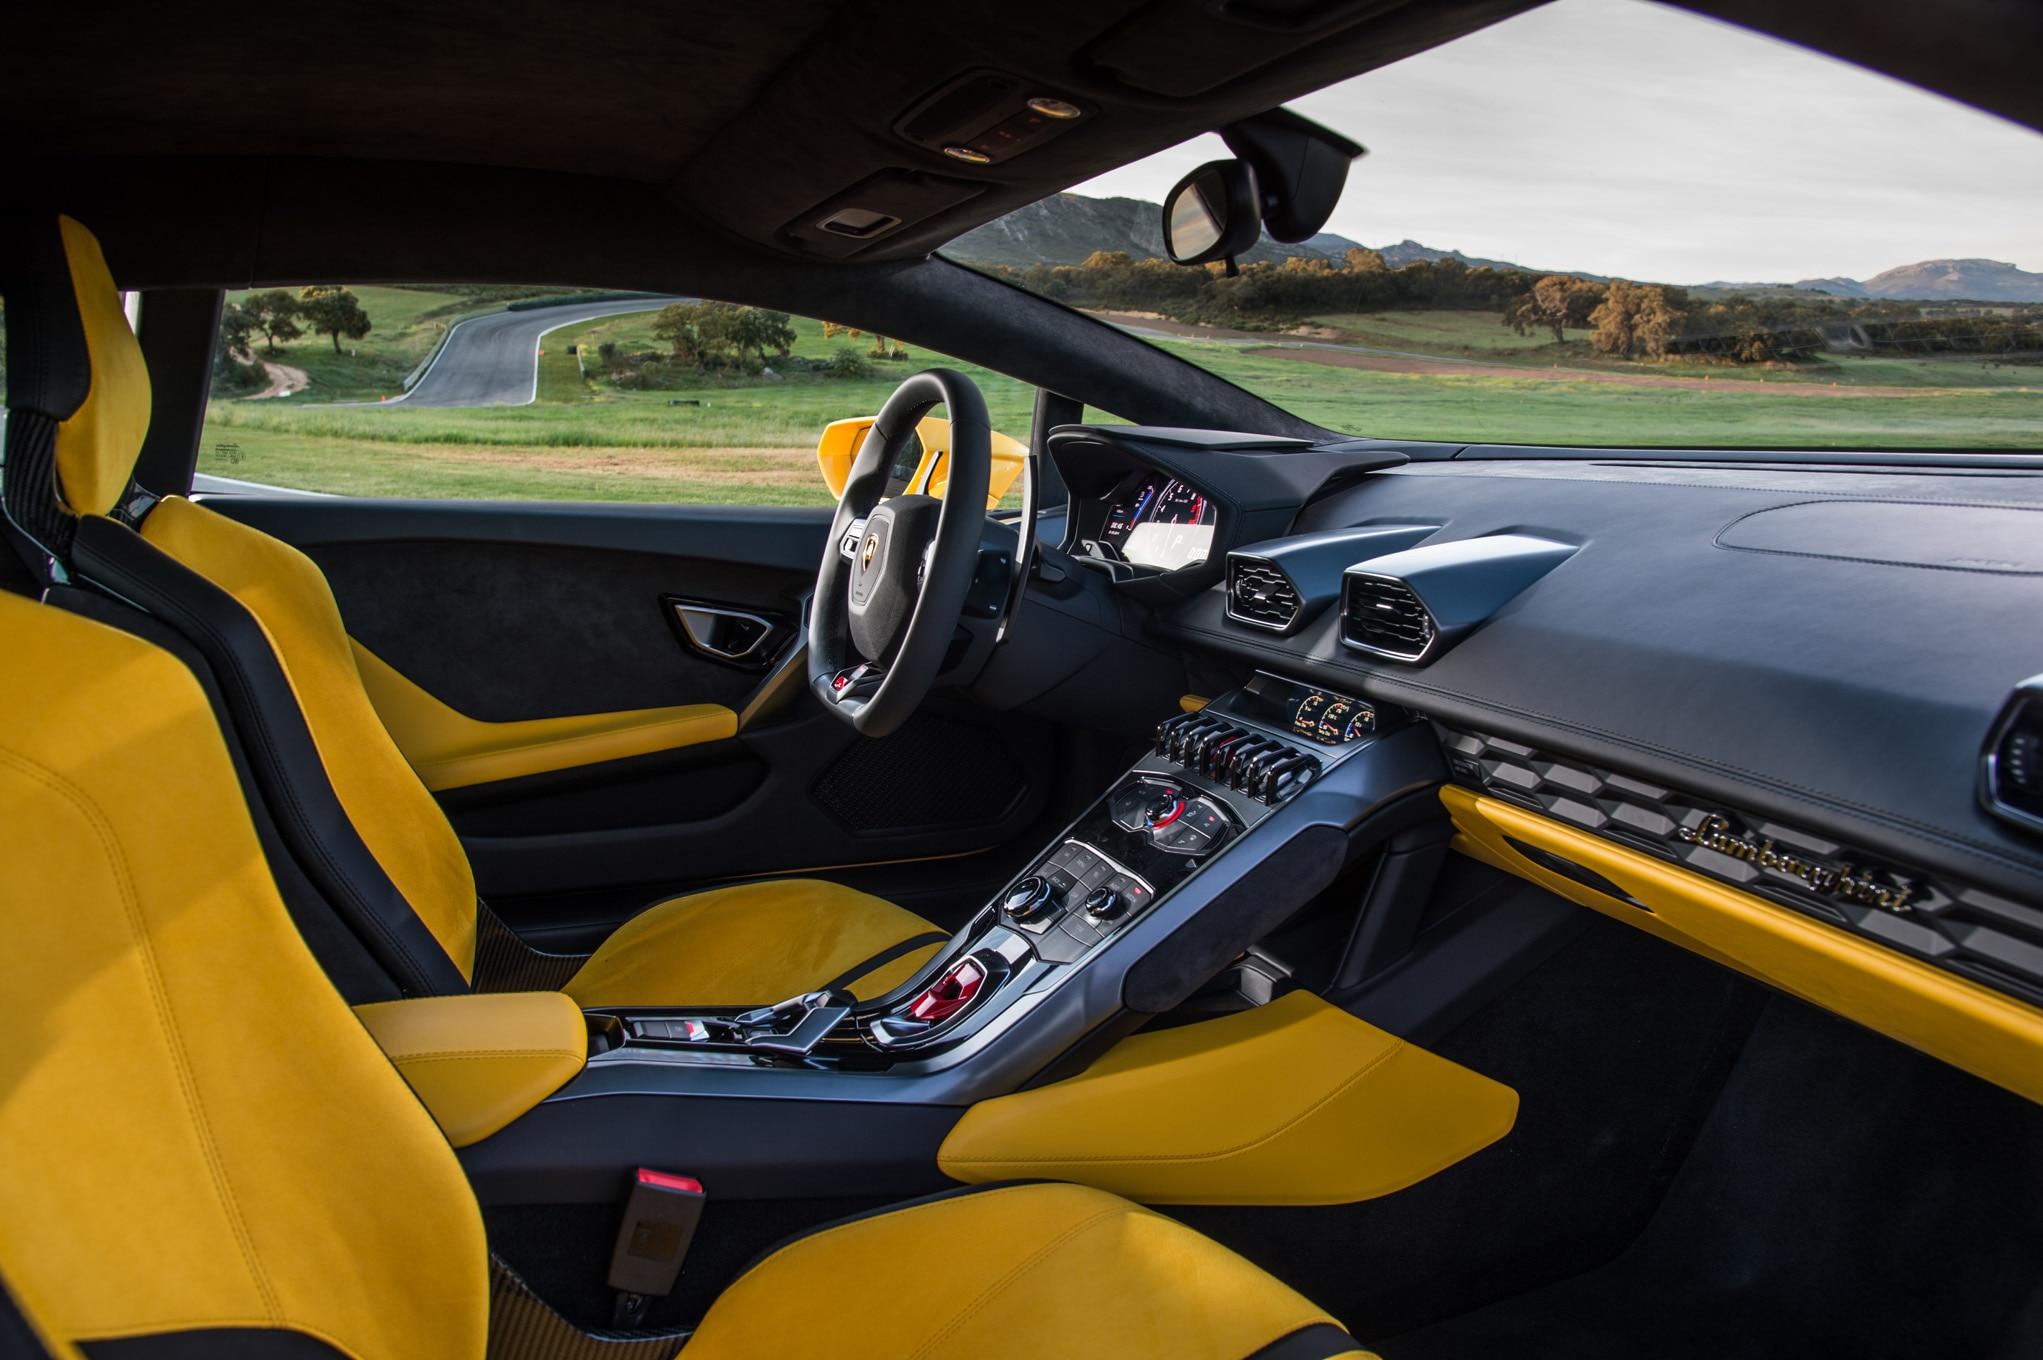 2015-Lamborghini-Huracan-LP-610-4-yellow-interior Amazing 2015 Lamborghini Huracan Price Per Month Cars Trend